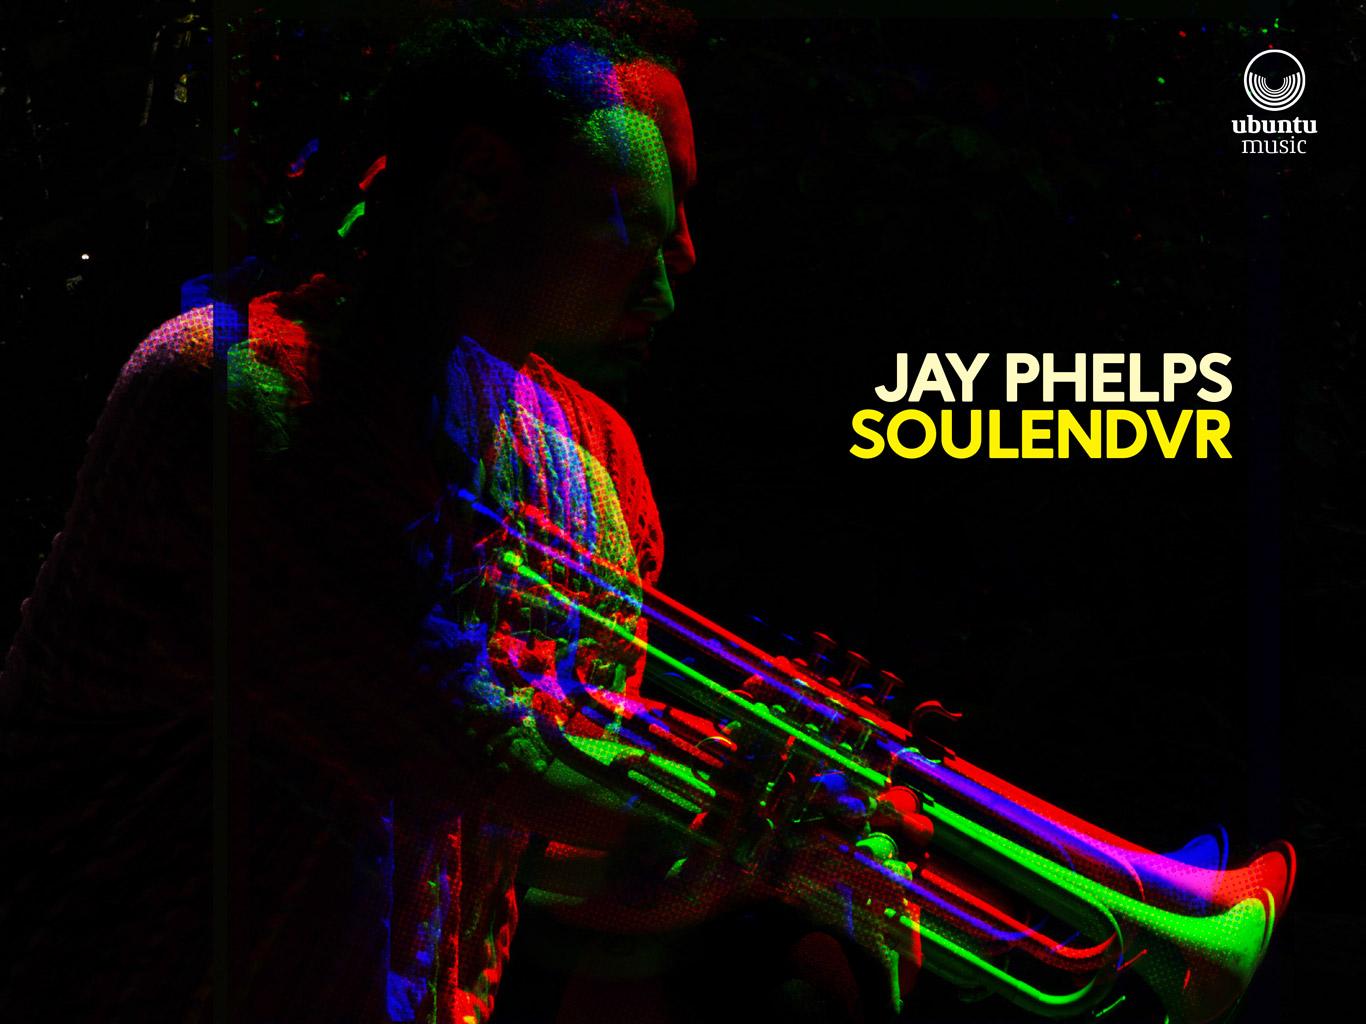 jay-phelps–soulendvr